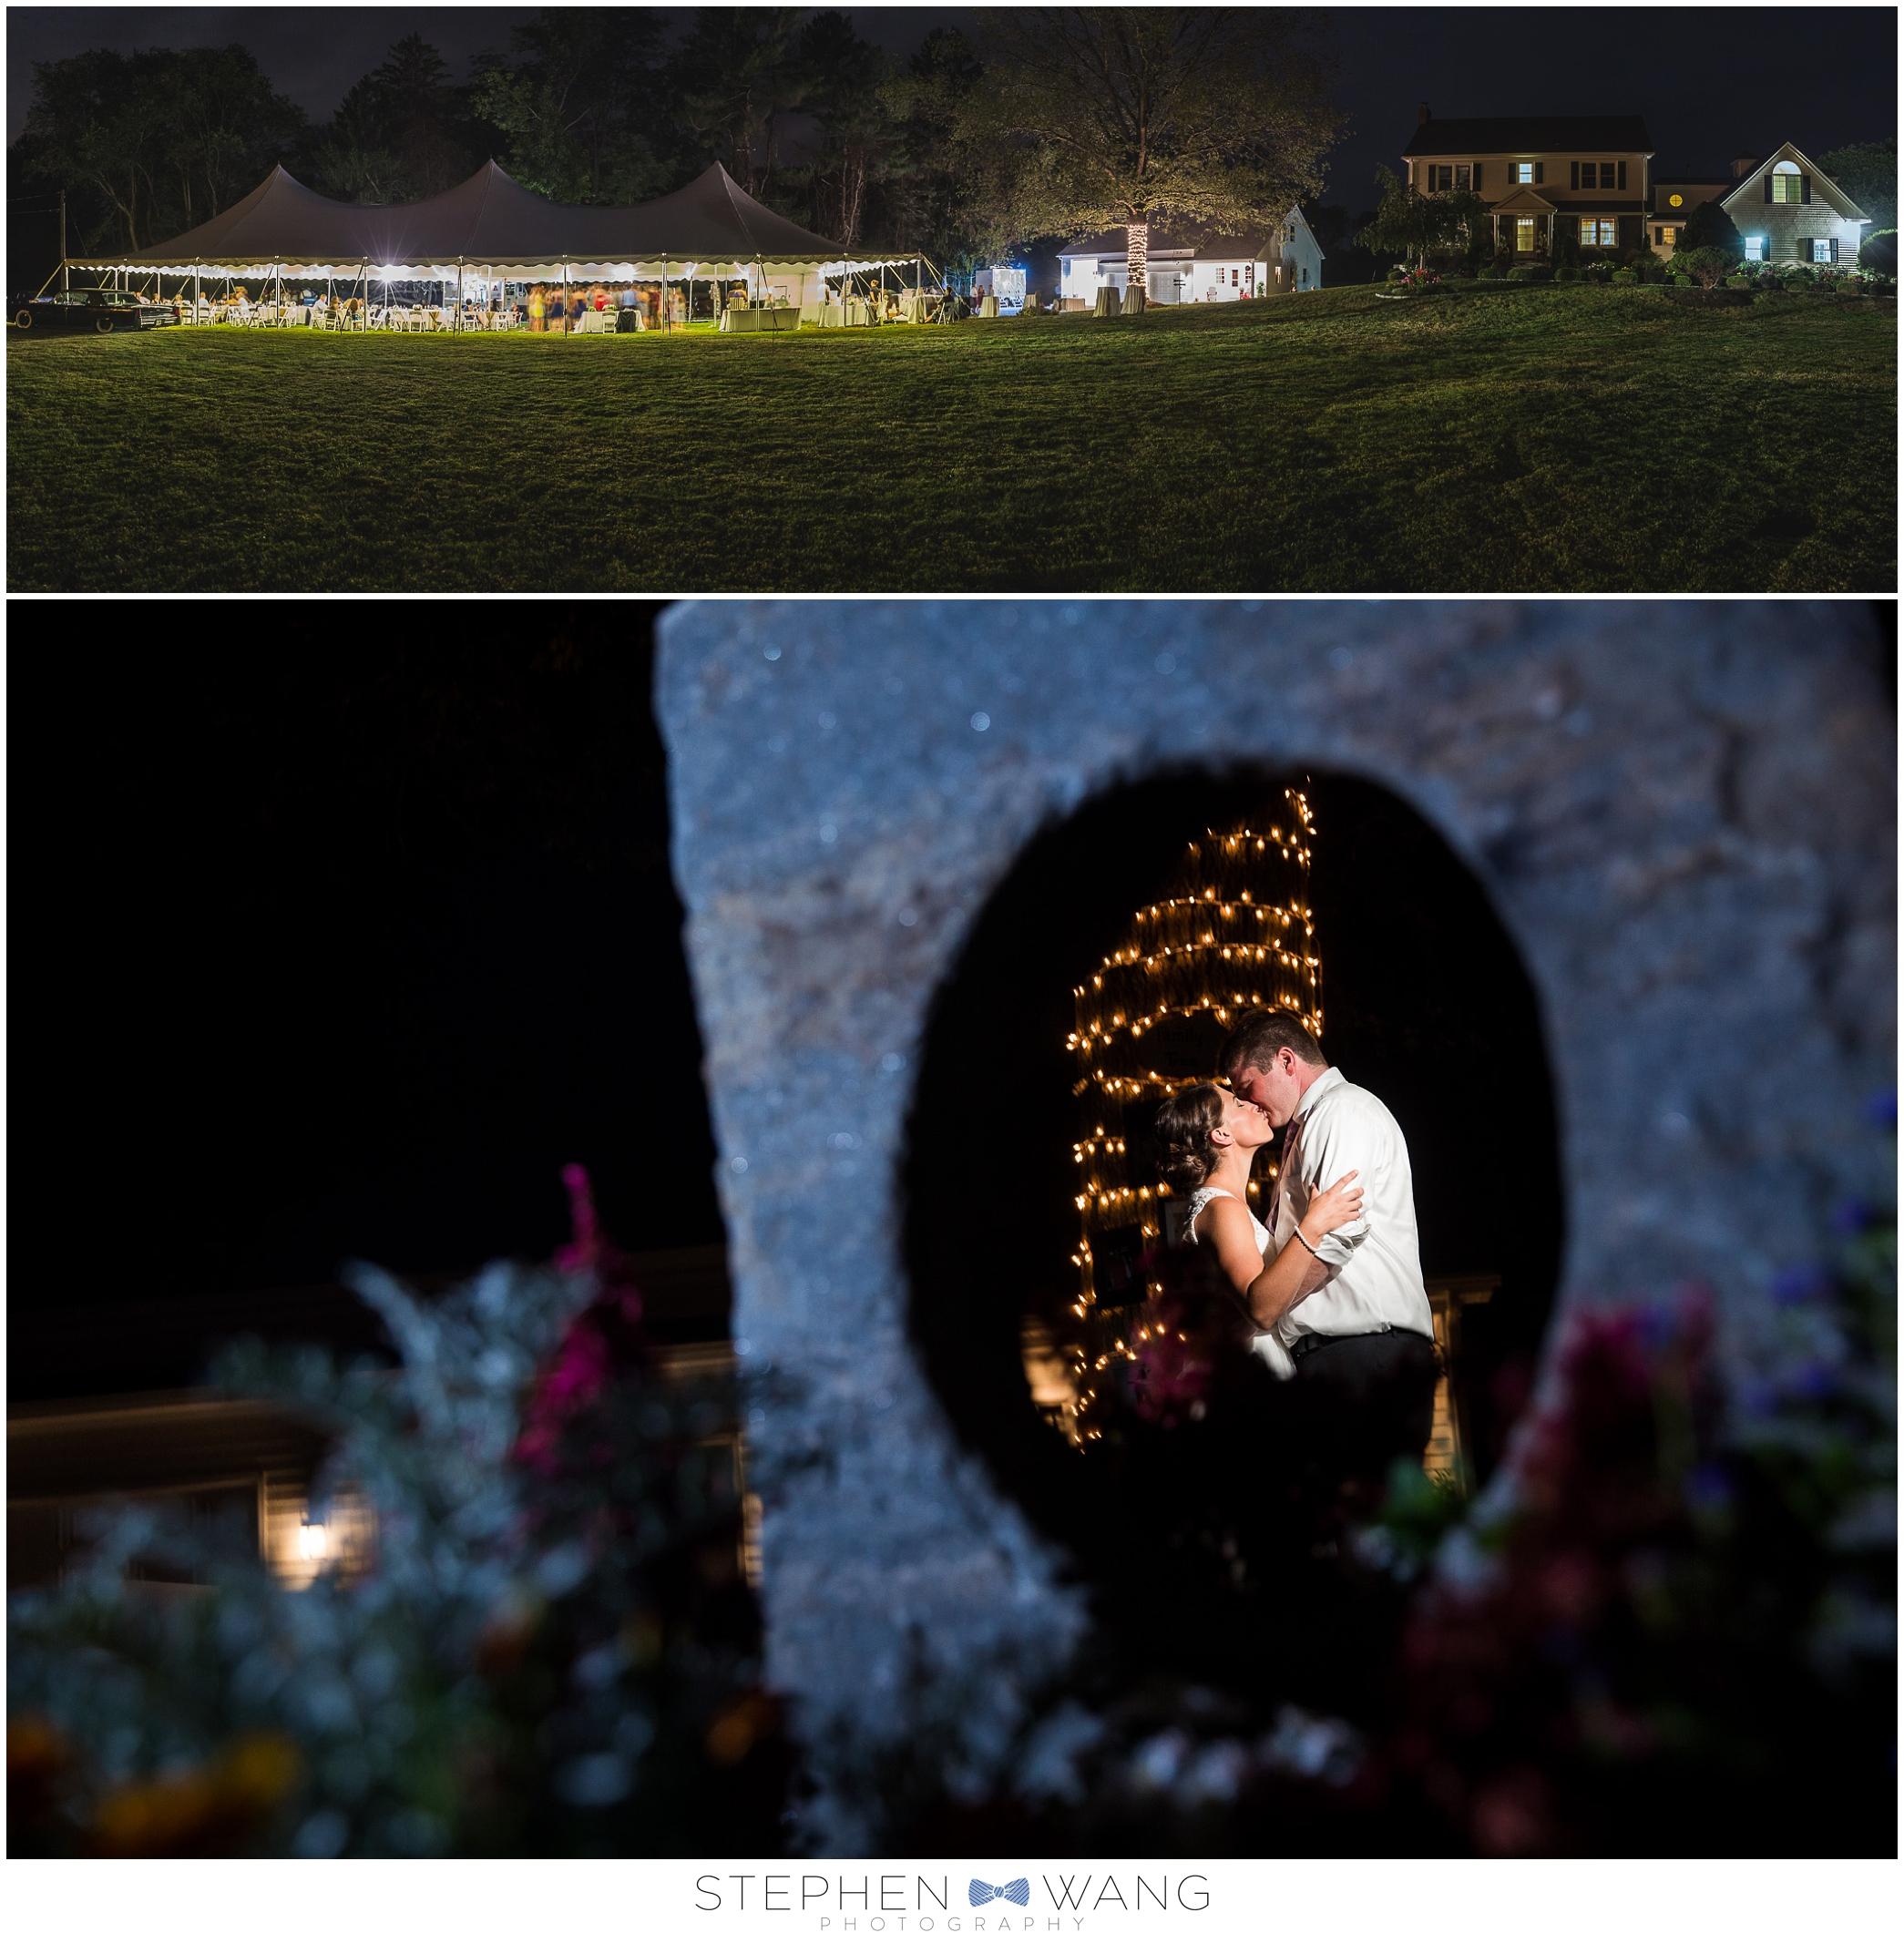 Stephen Wang Photography wedding photographer haddam connecticut wedding connecticut photographer philadlephia photographer pennsylvania wedding photographer bride and groom00042.jpg